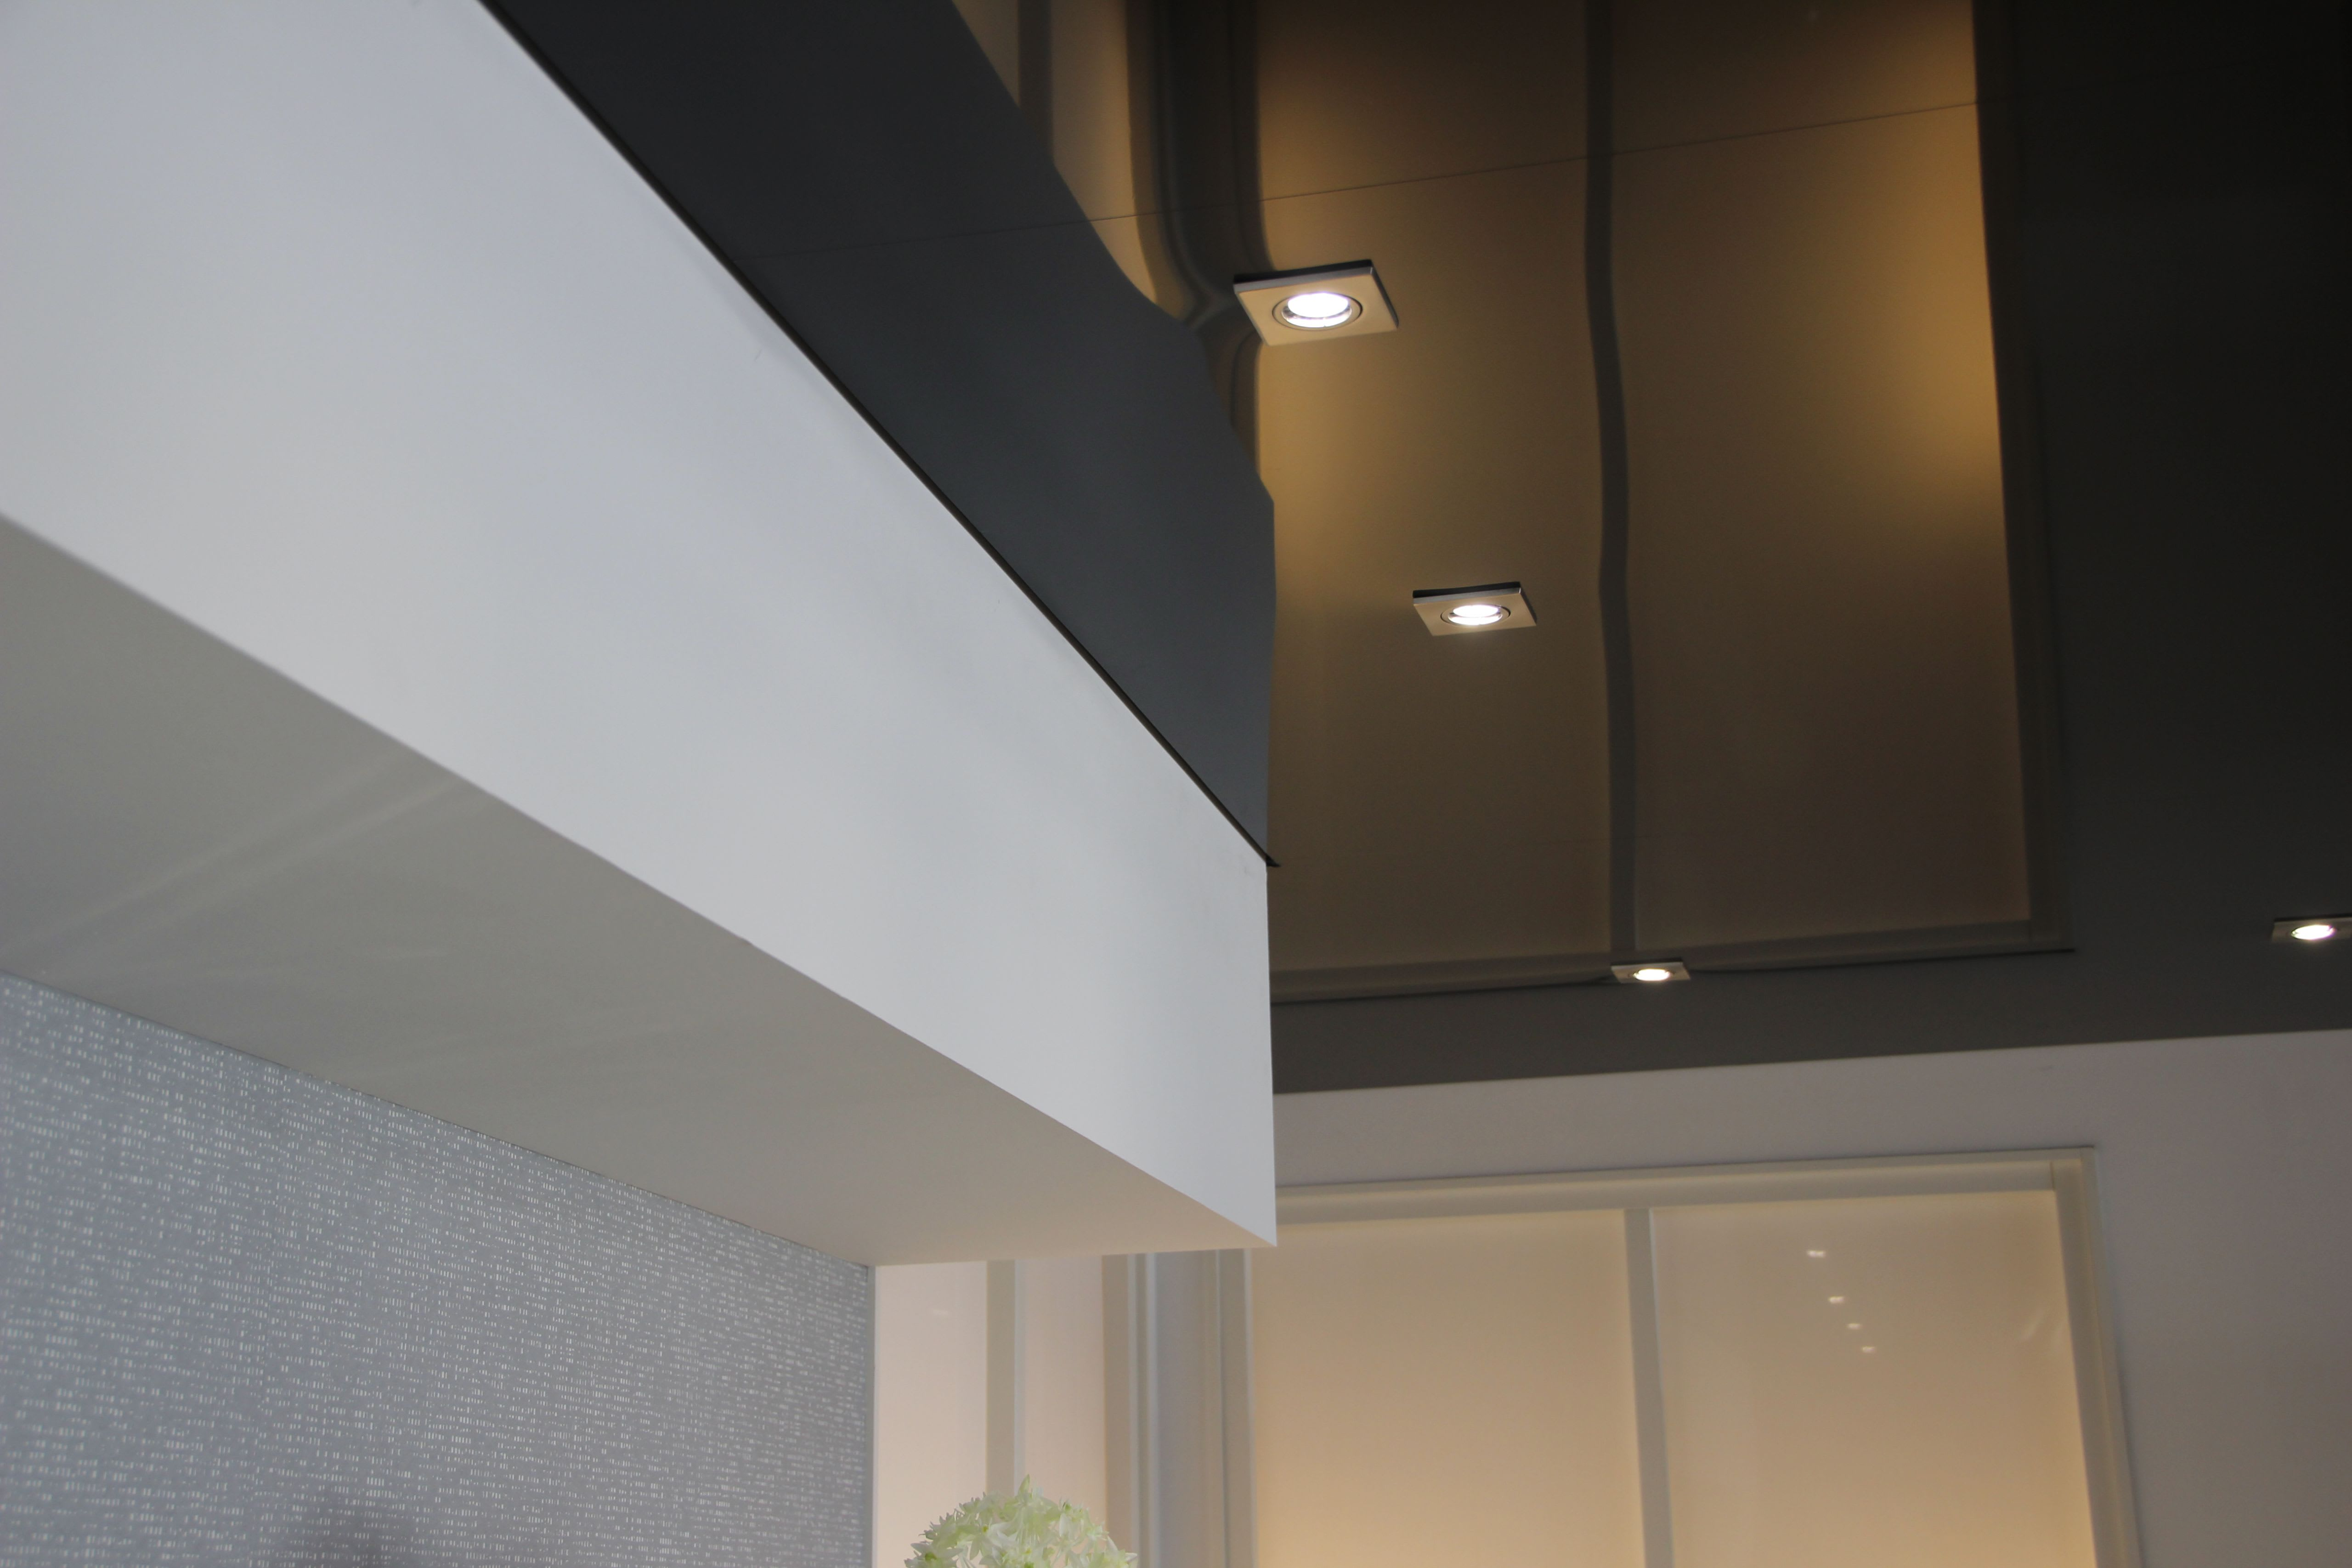 Galerie Ausstellungsräume graue hochglanz Spanndecke Beleuchtung 5